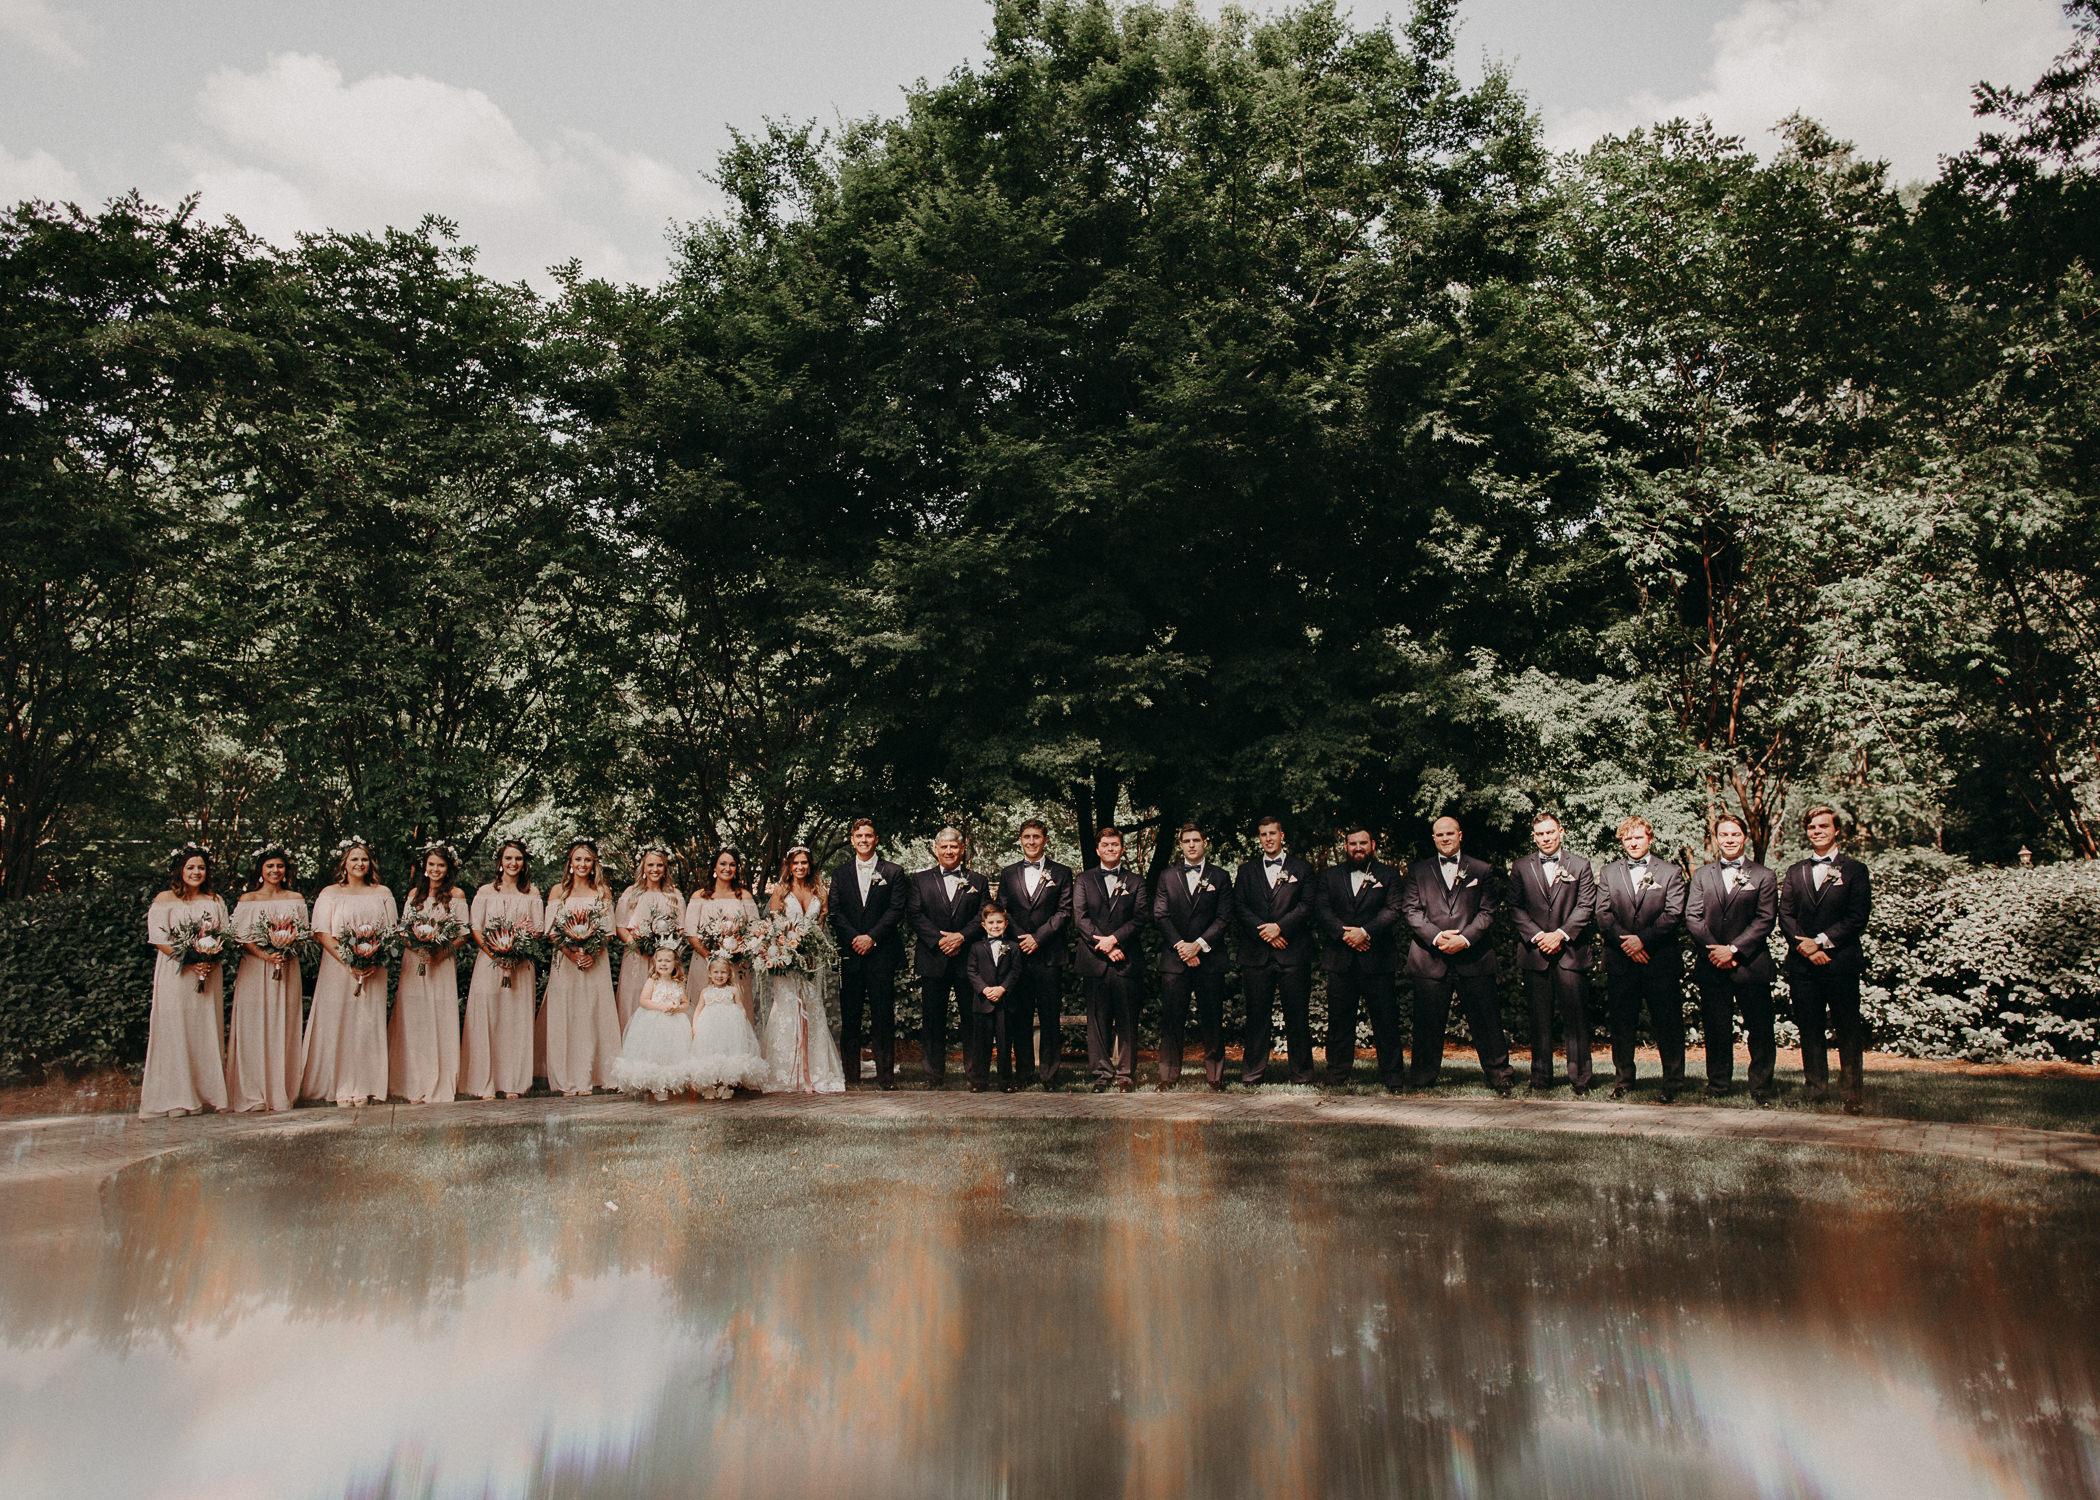 42Carl House Wedding Venue Ga, Atlanta Wedding Photographer - Boho, Bohemian, Junebug Weddings, Vintage, Retro, Trendy. Aline Marin Photography. .jpg